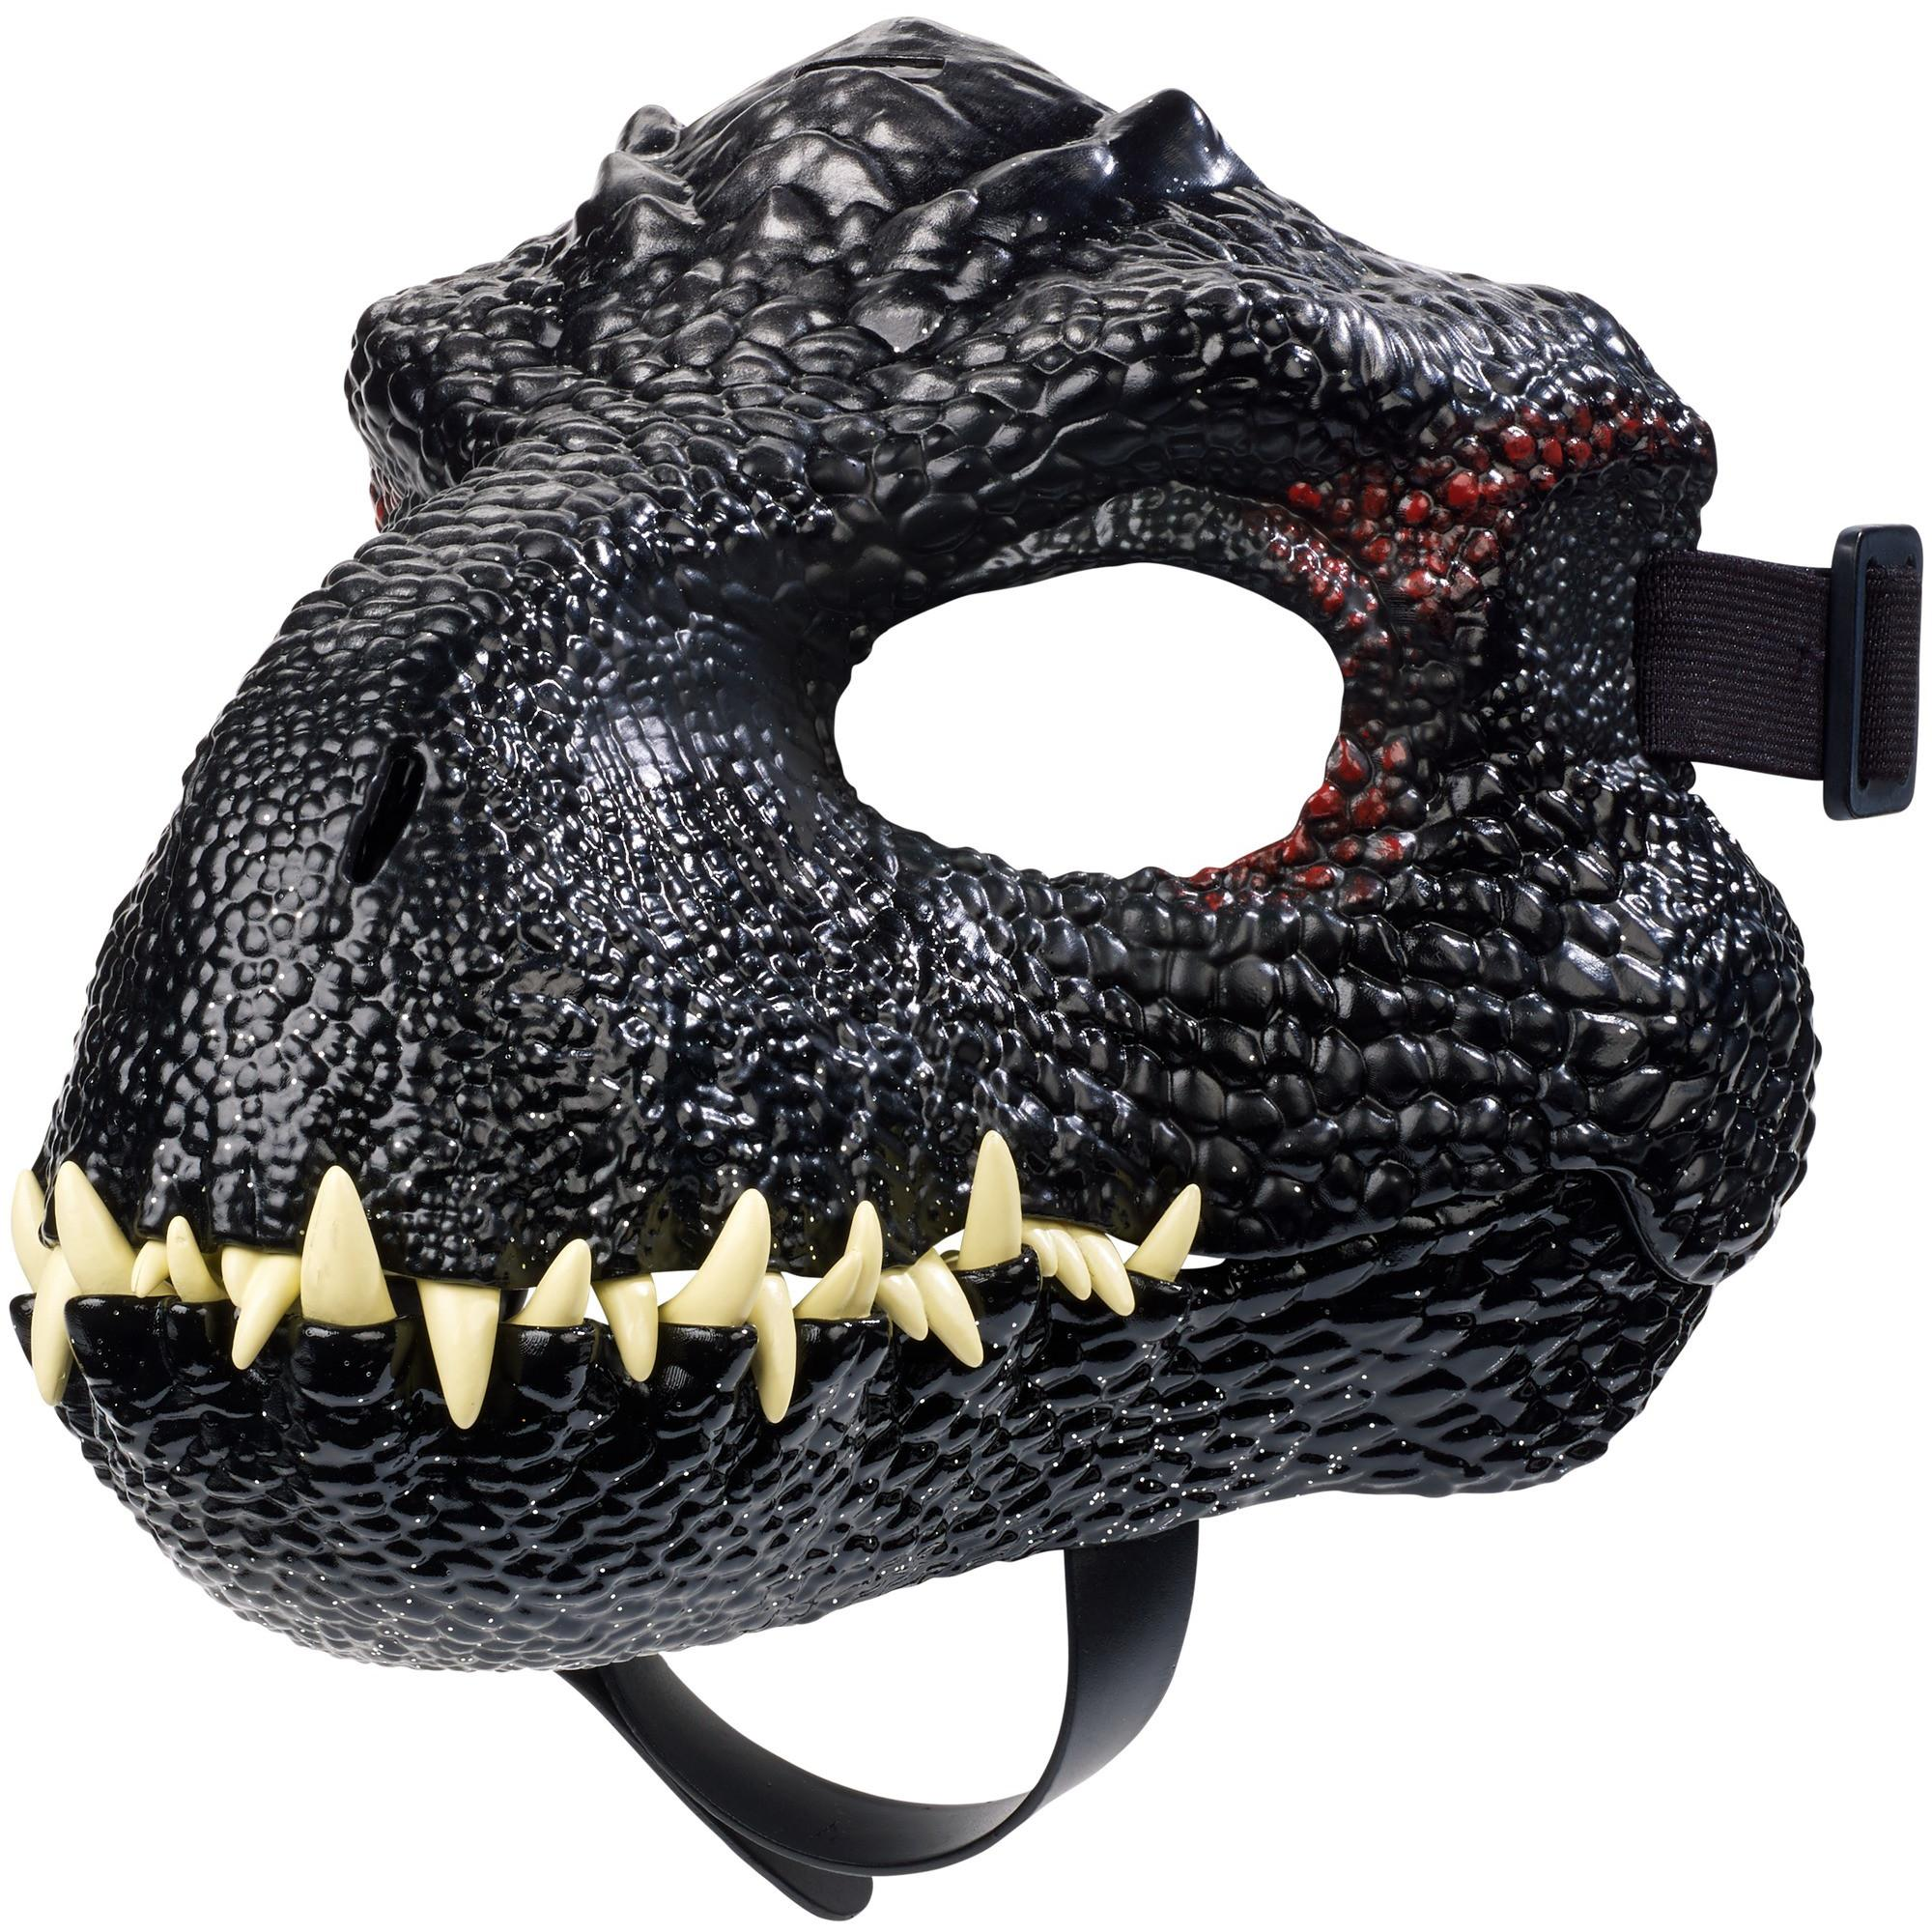 Jurassic World Indoraptor Mask